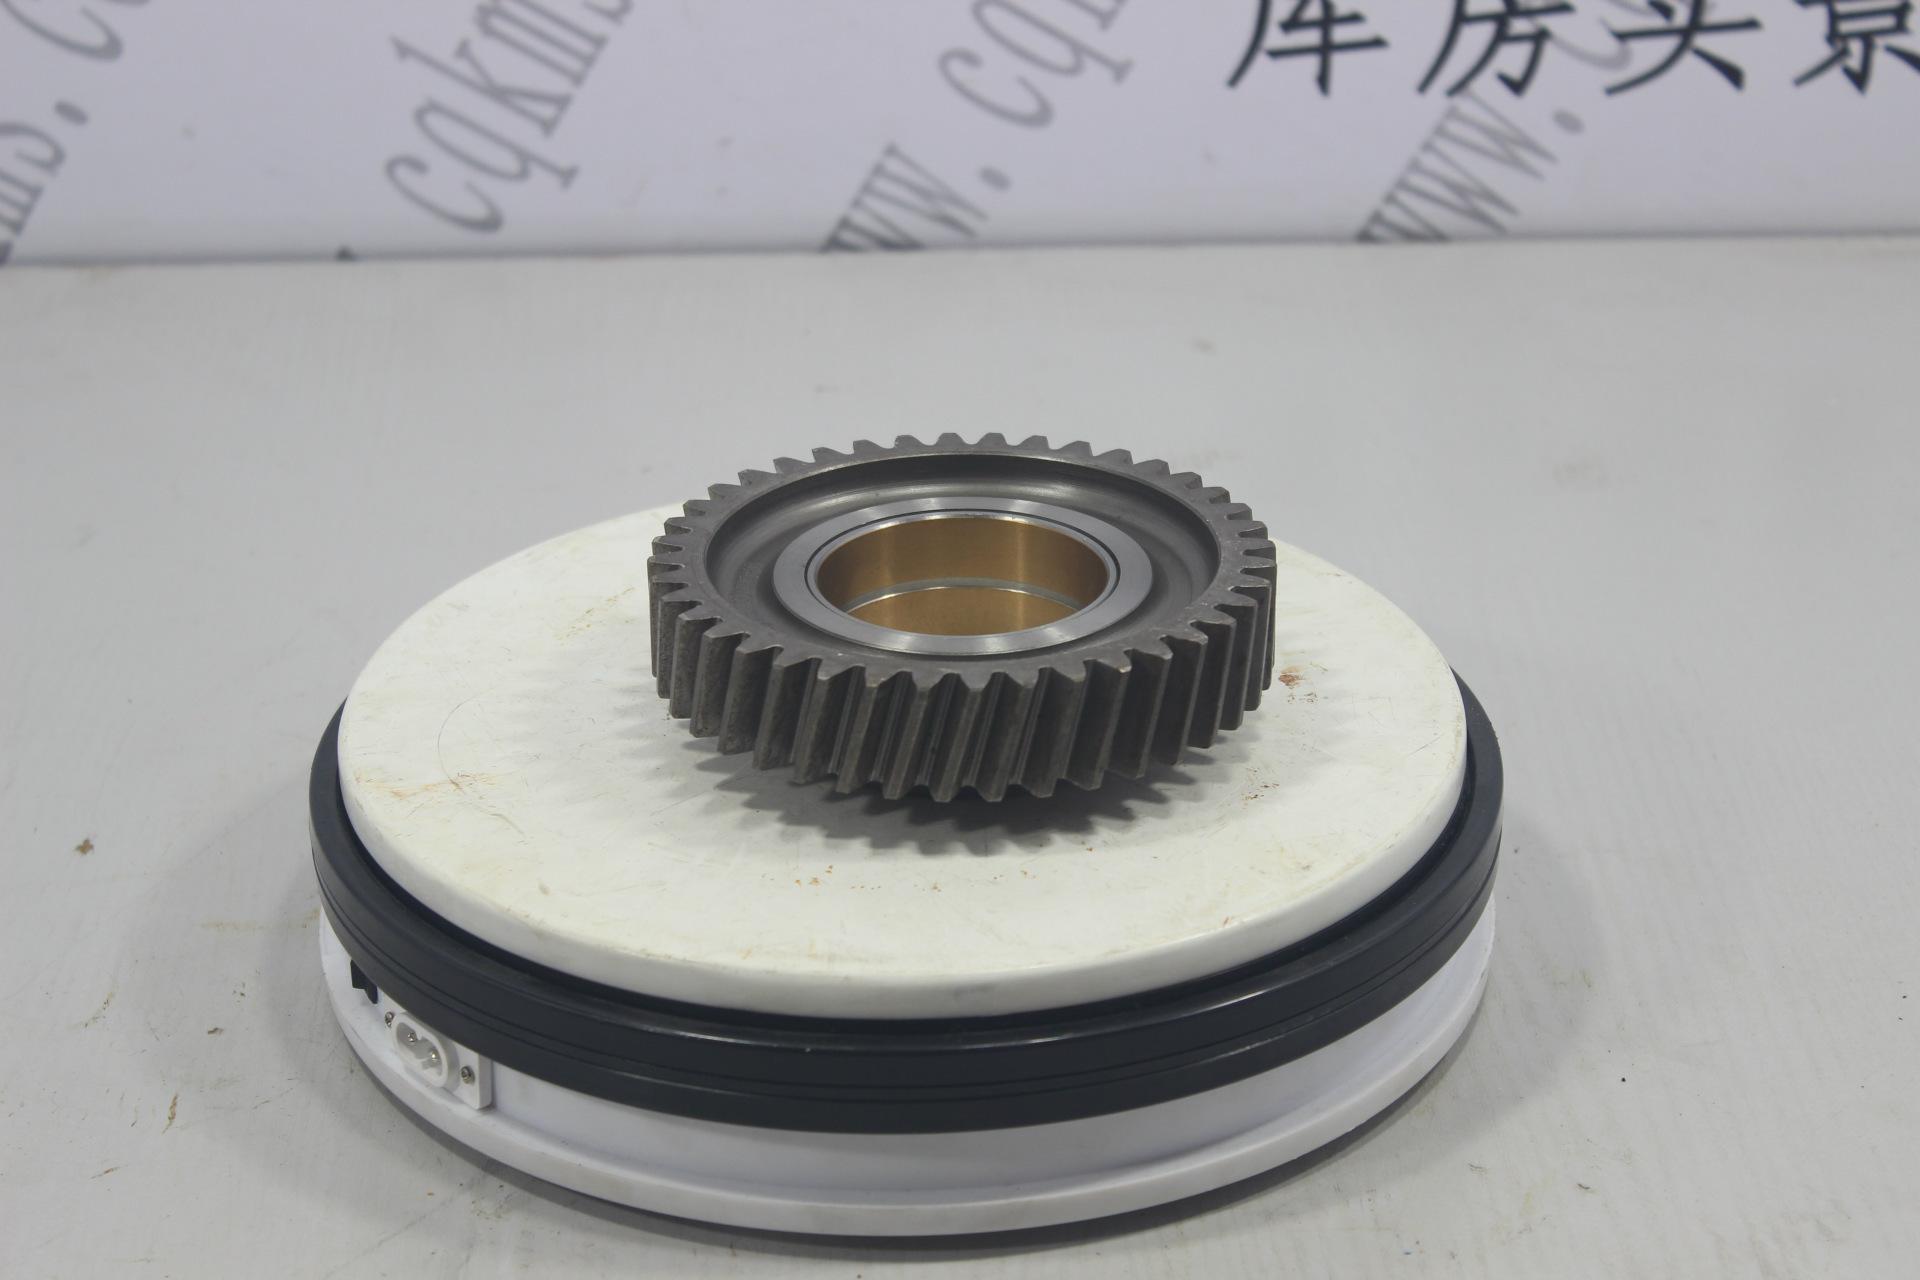 kms00889-3045873-惰齿轮----参考重量1.6Kg-1.6Kg图片2